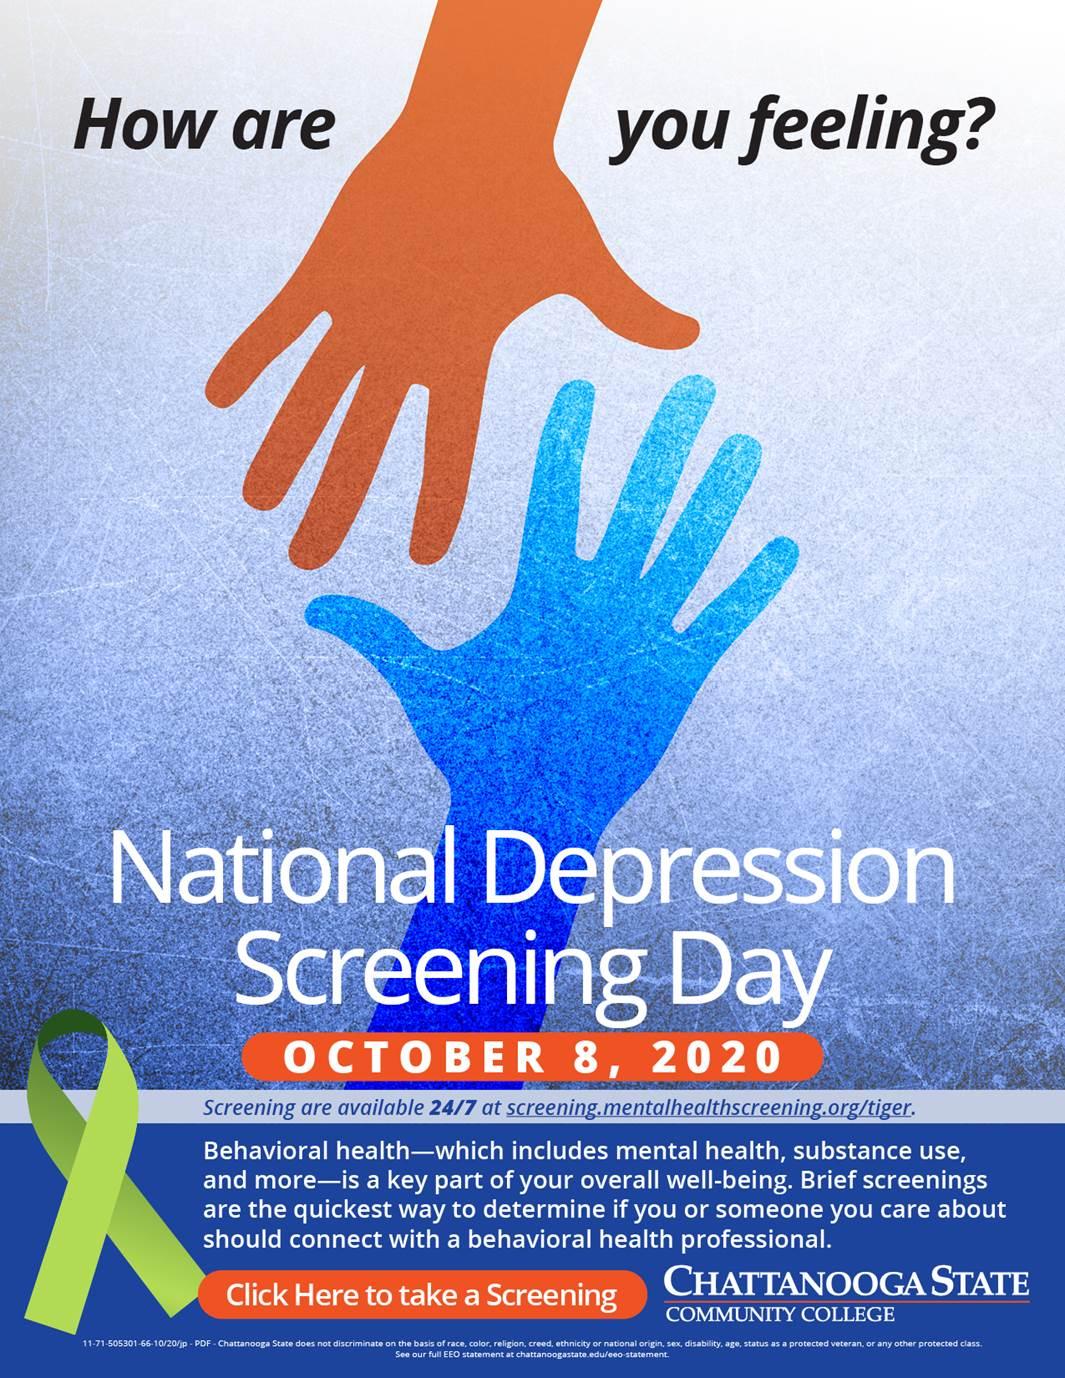 national depression day screening